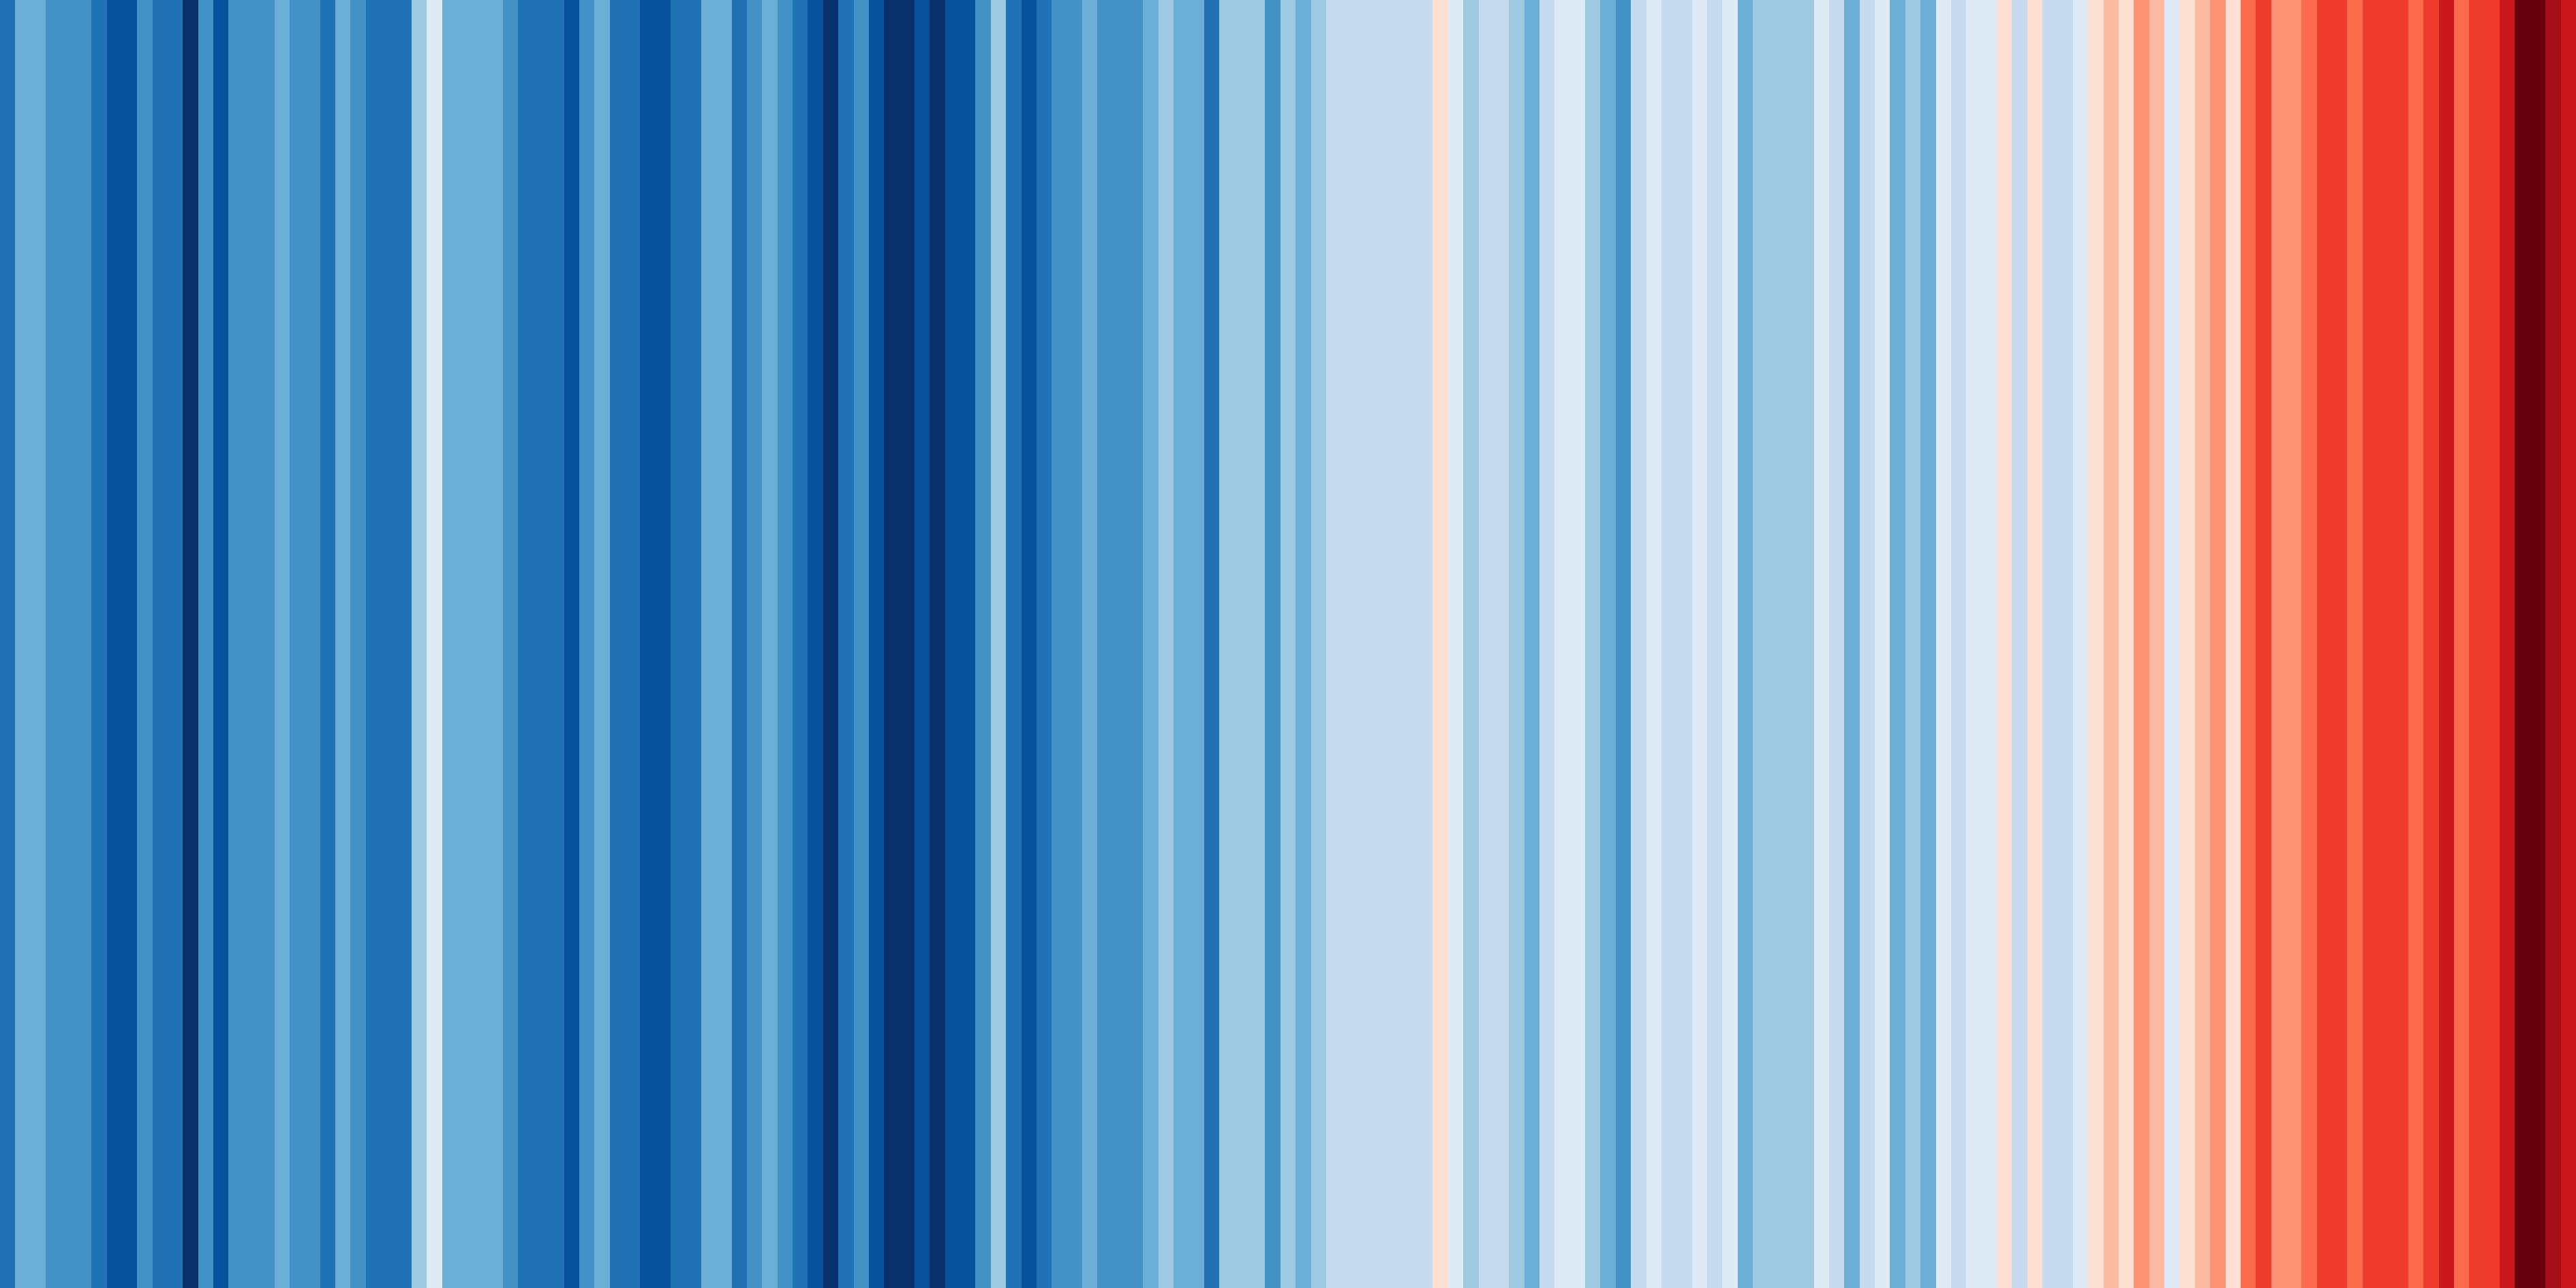 Evidencias de la crisis climática